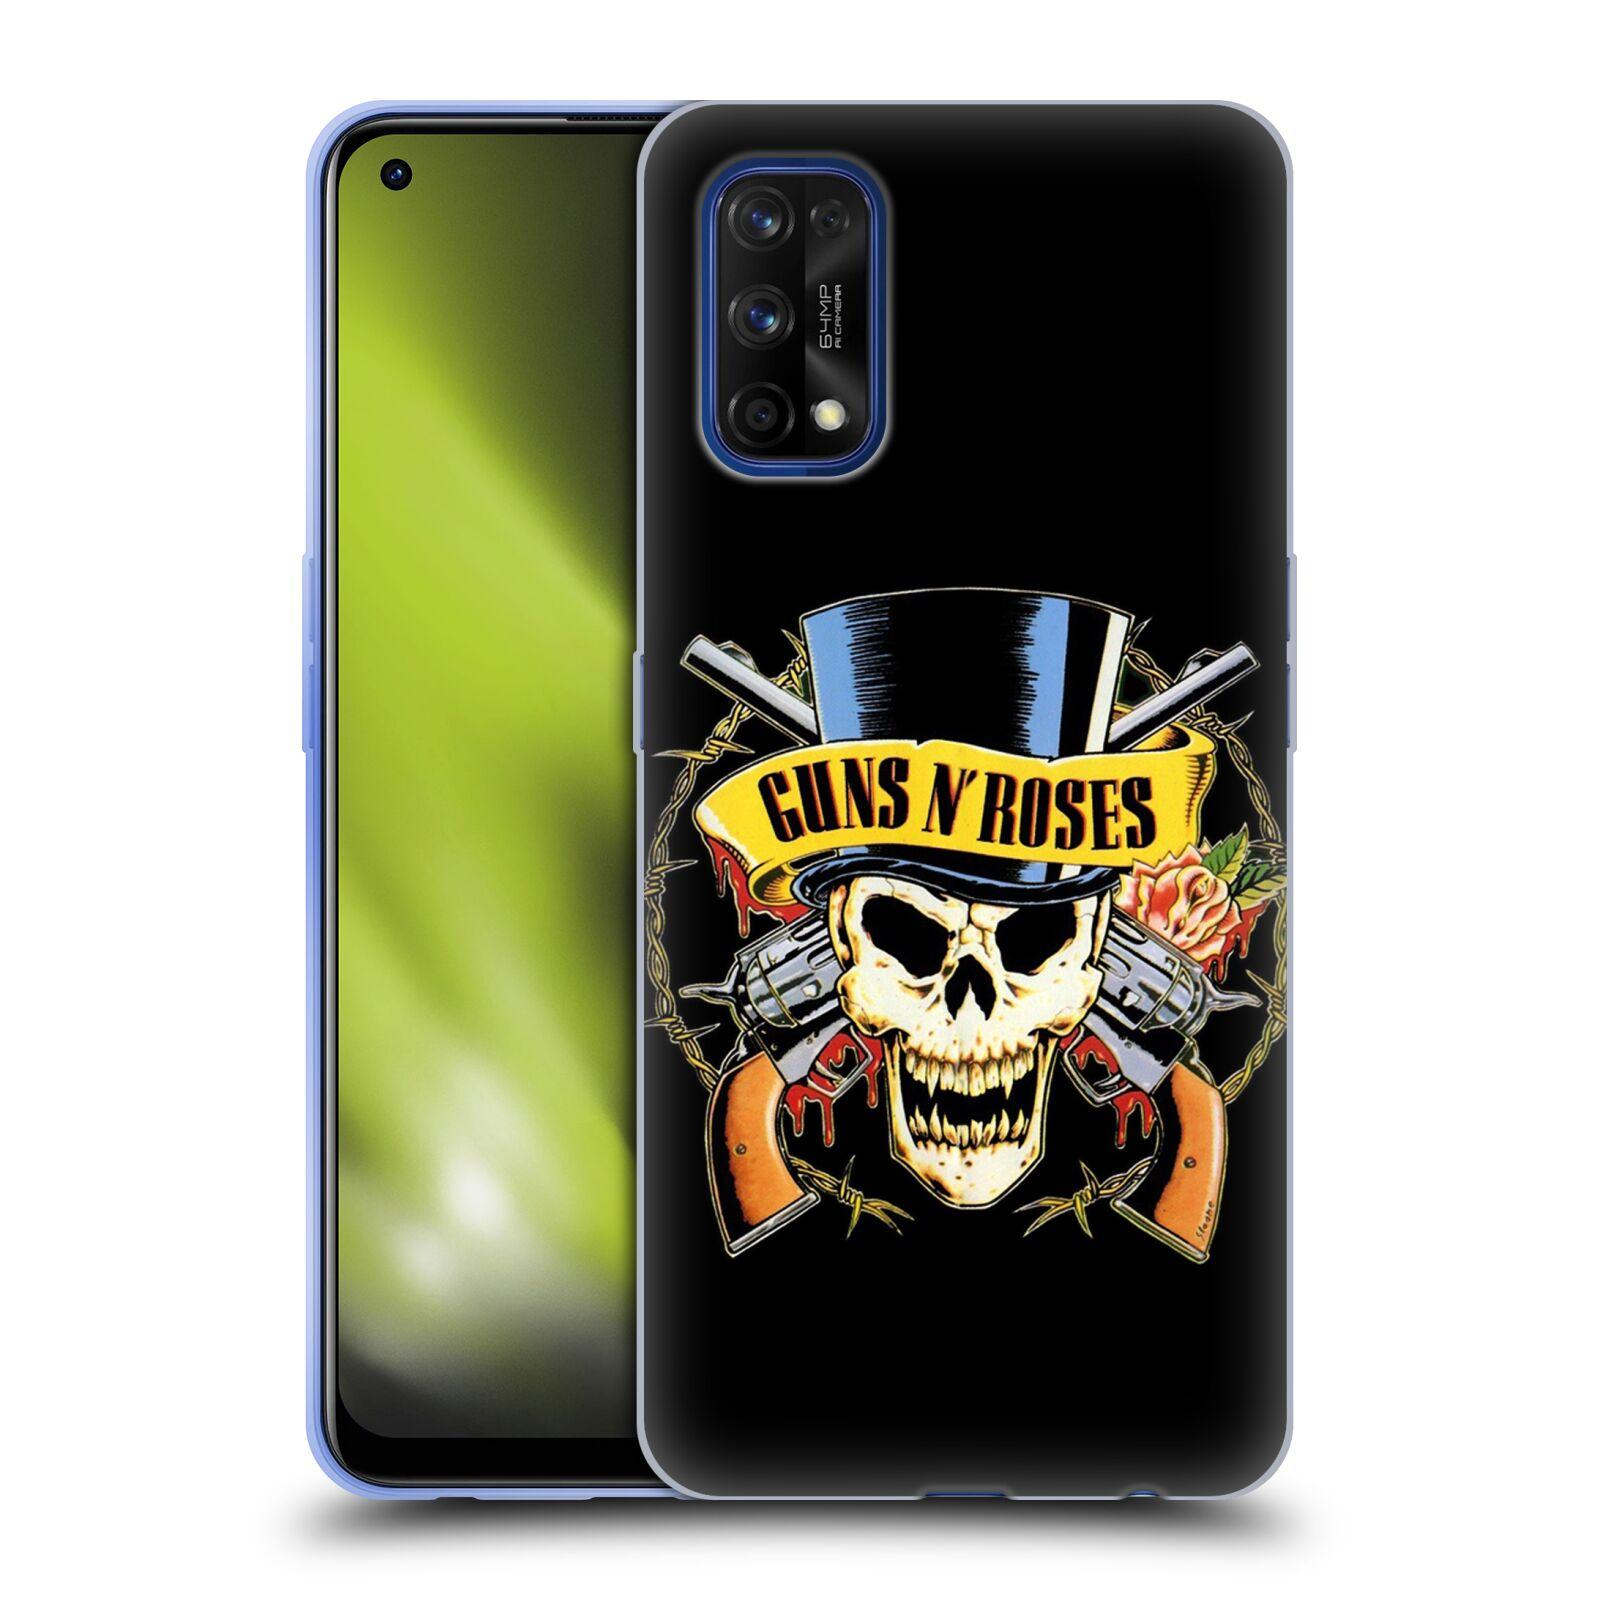 Silikonové pouzdro na mobil Realme 7 Pro - Head Case - Guns N' Roses - Lebka